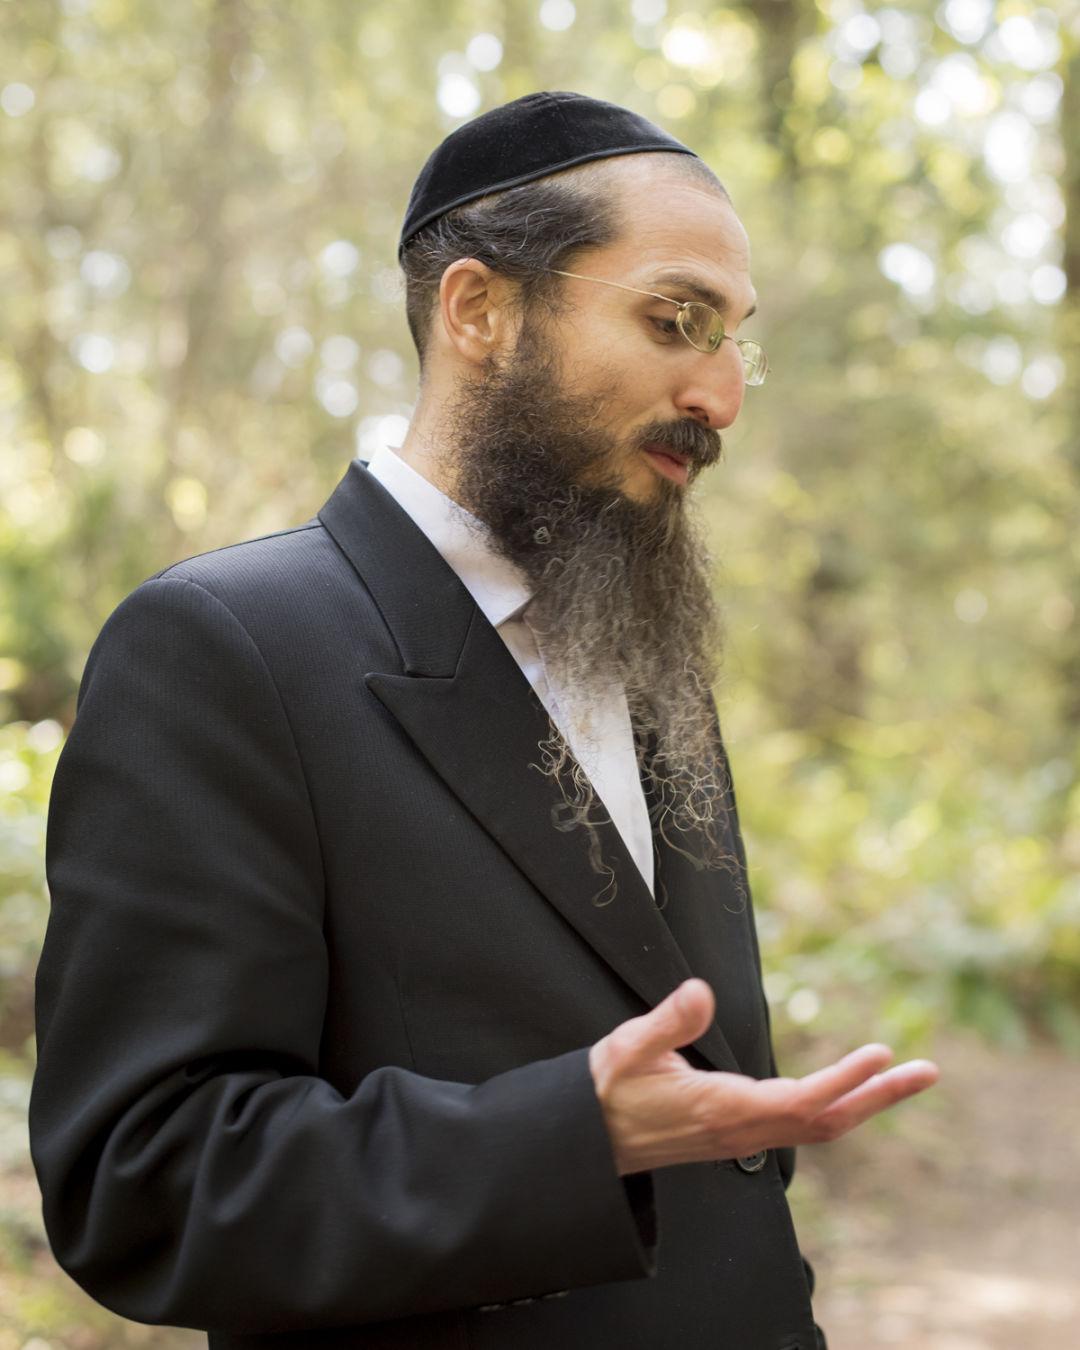 Jis 0616 rabbi shmuel brody b2dvzl